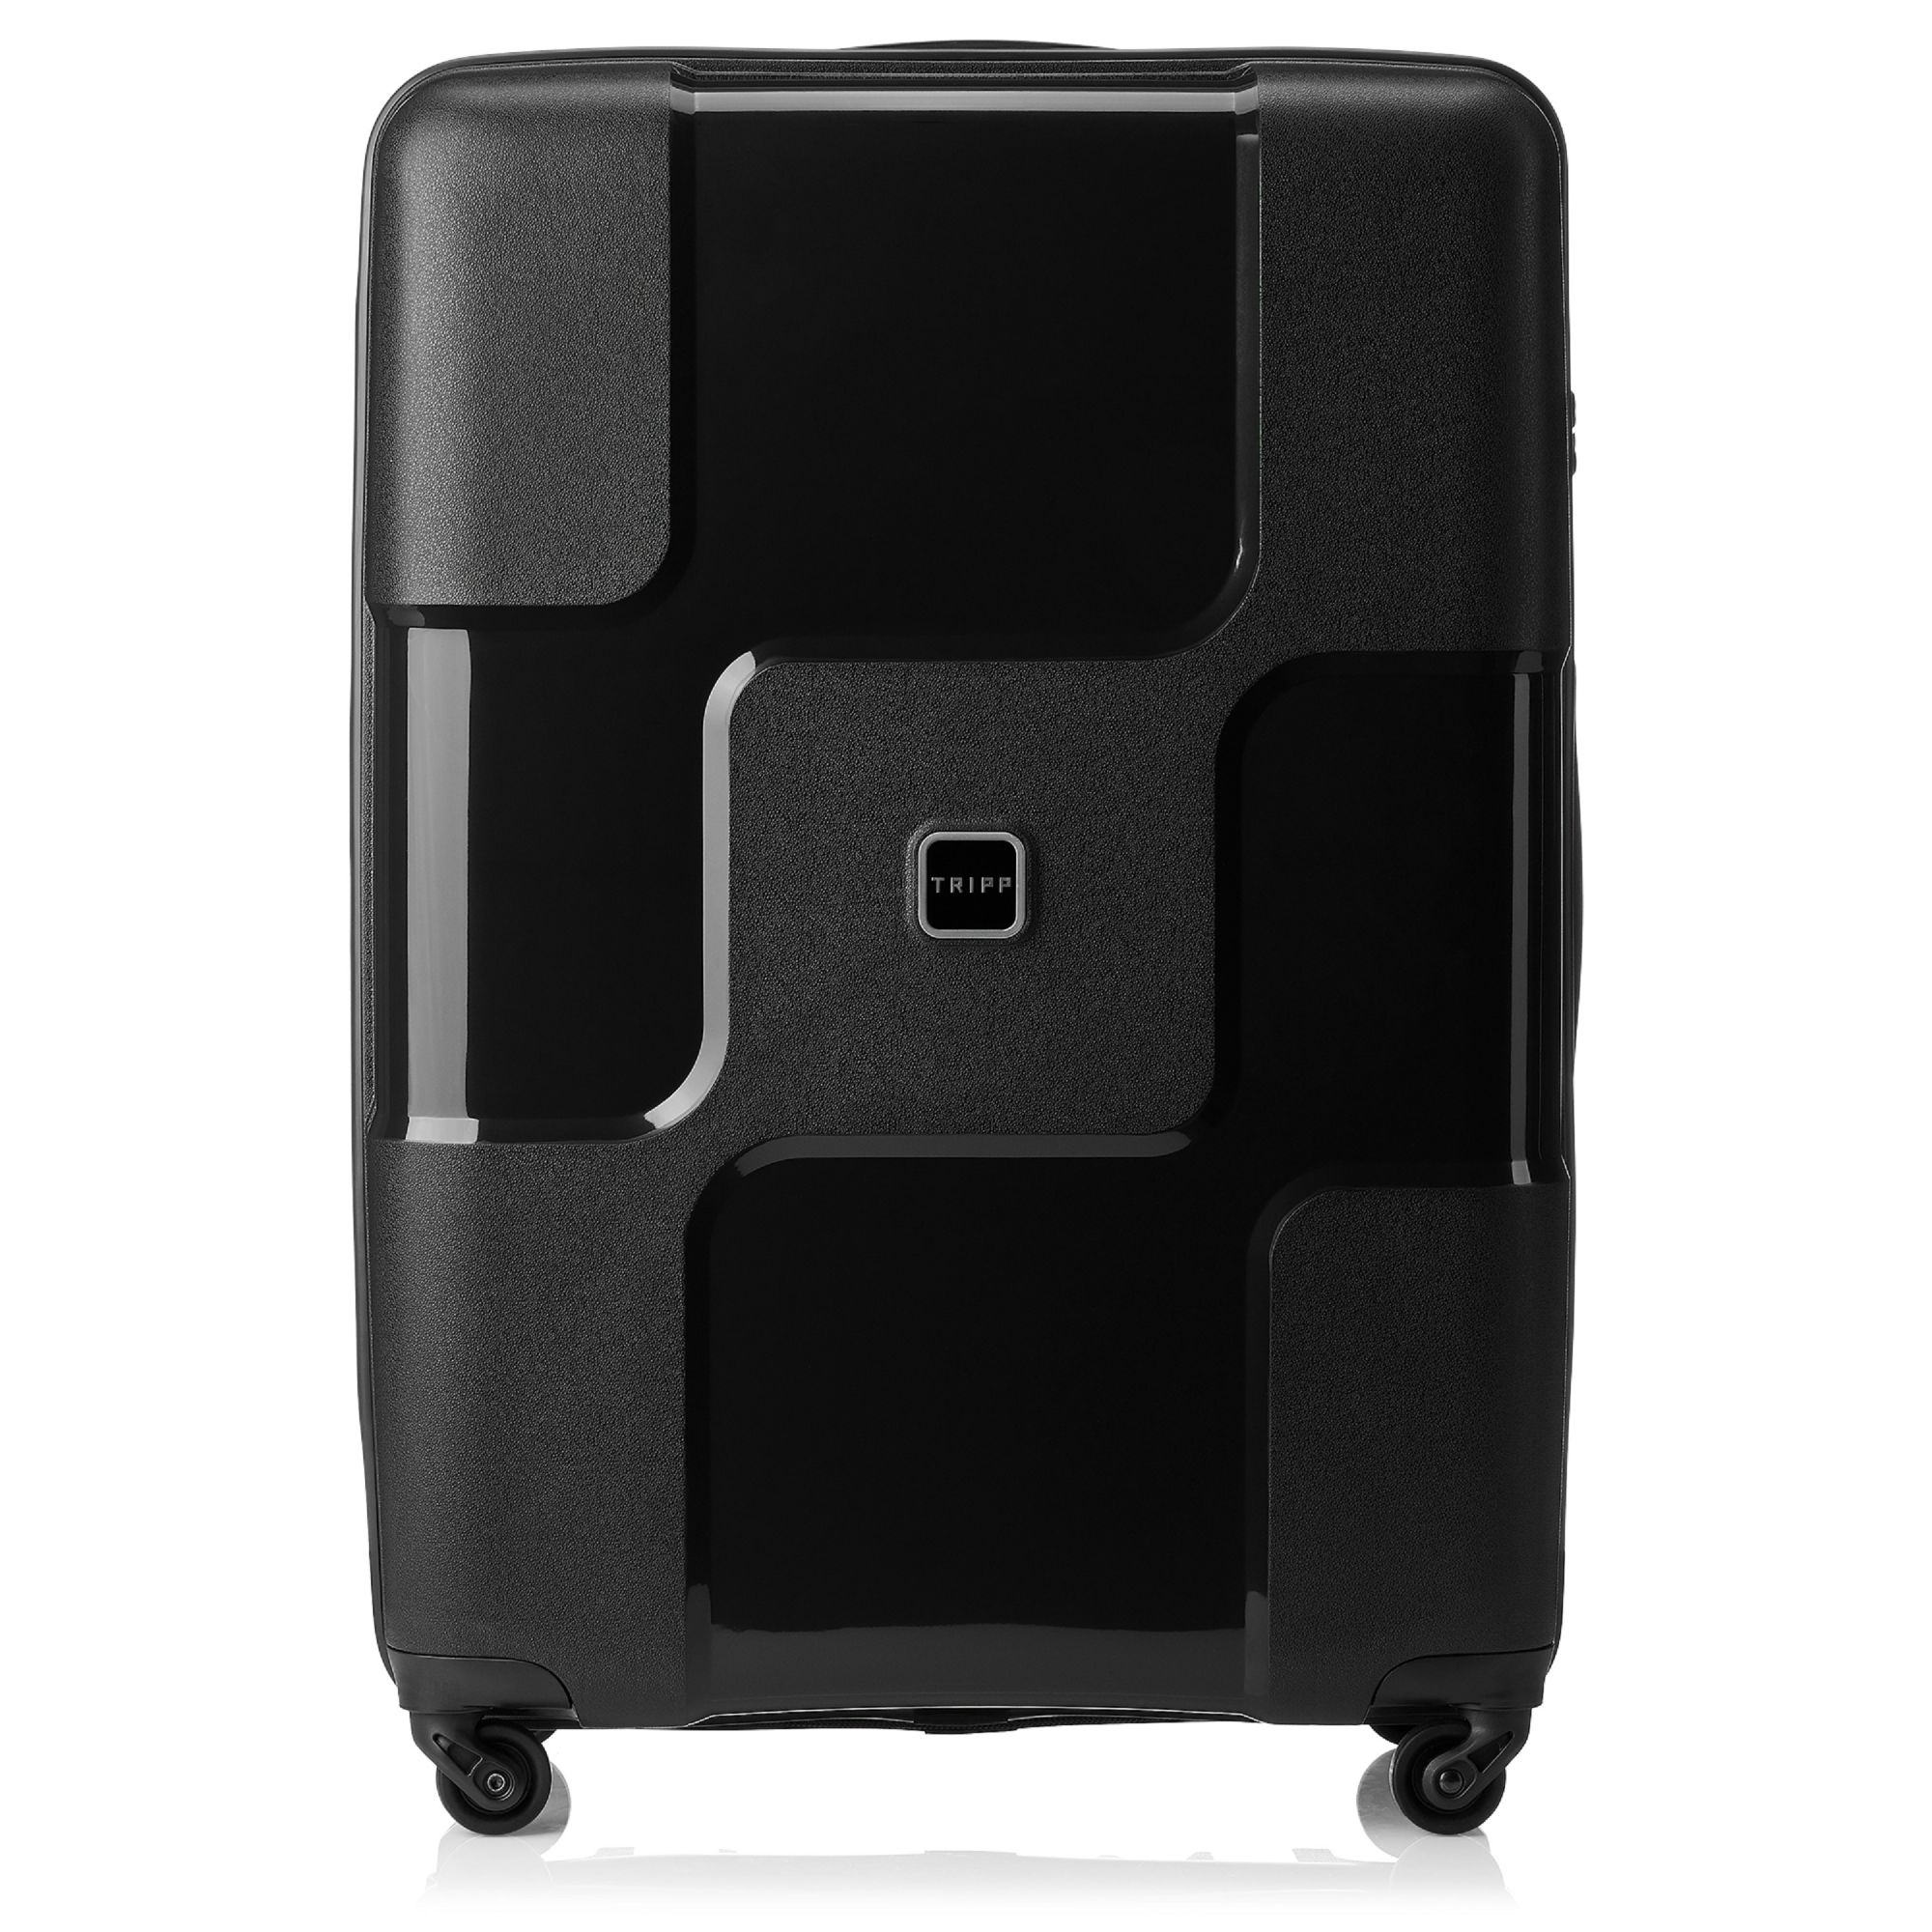 tripp black ii 39 world 39 4 wheel large suitcase hard. Black Bedroom Furniture Sets. Home Design Ideas